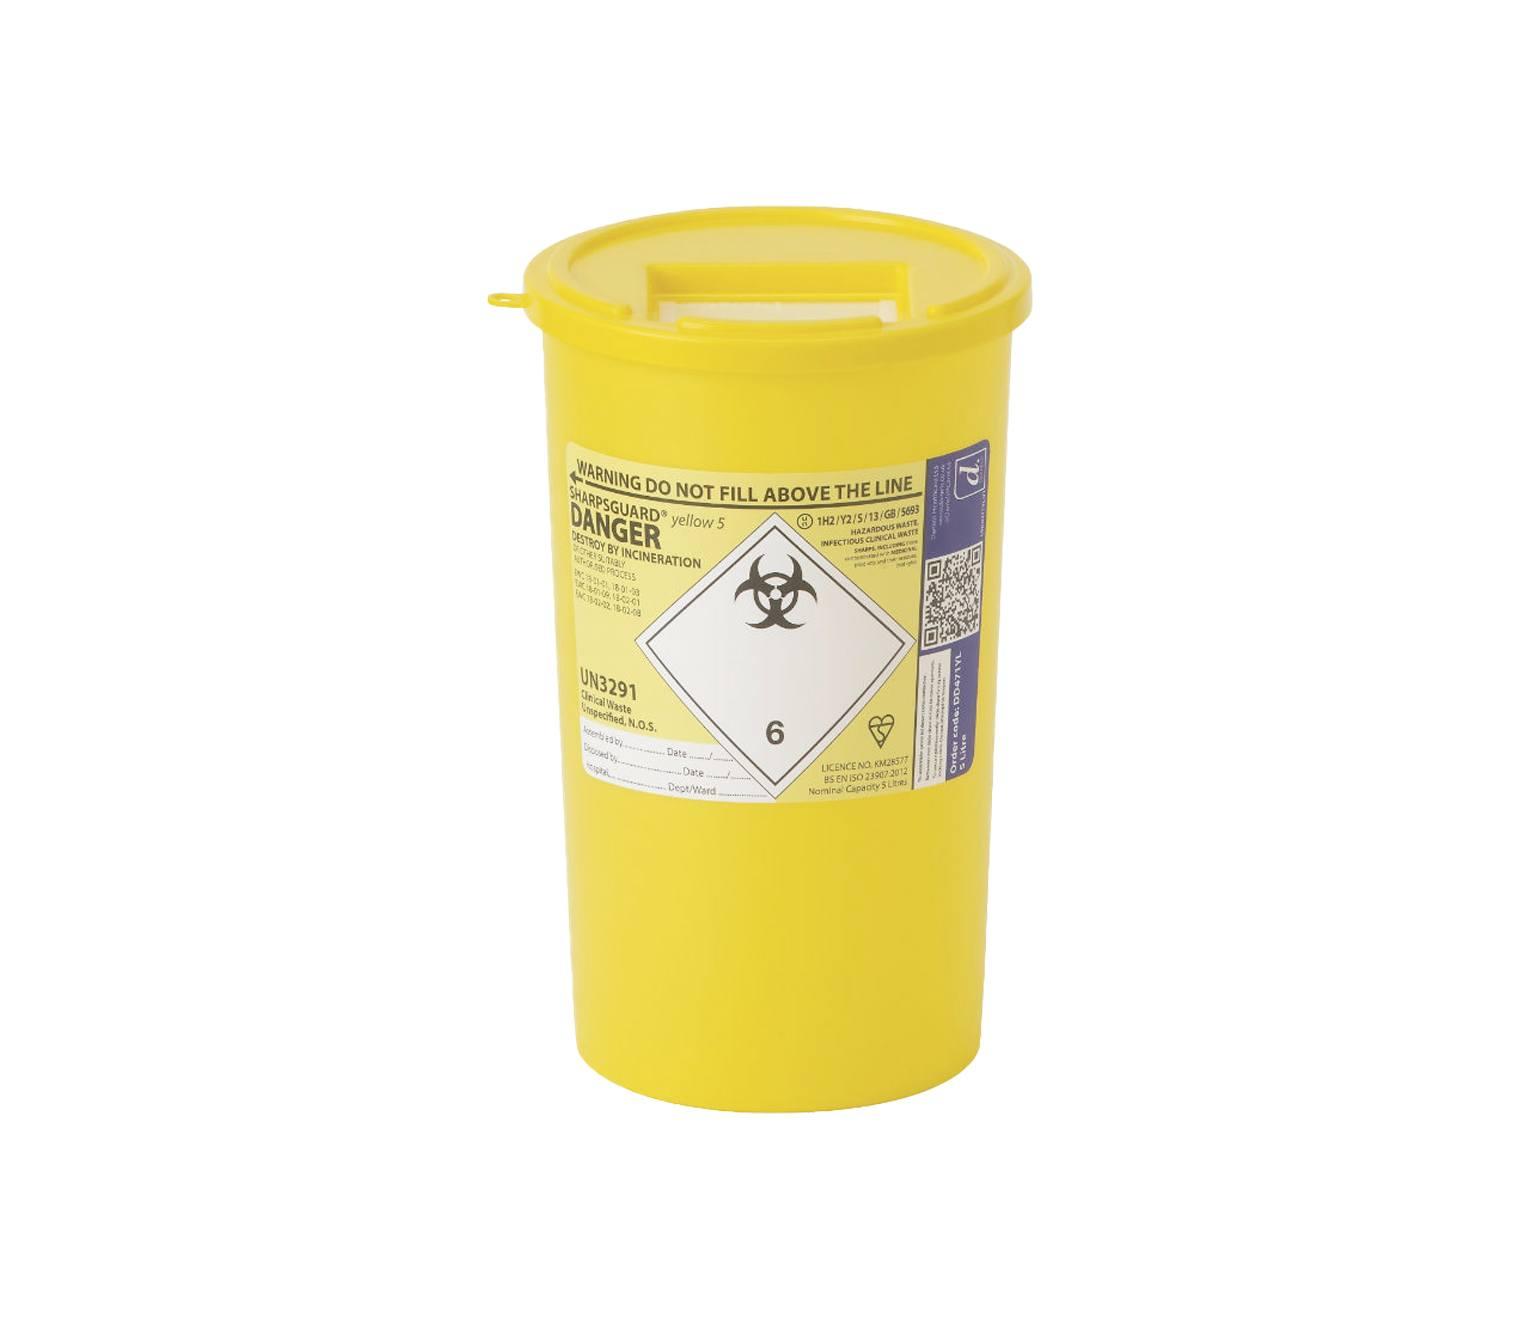 Sharpsguard 5 Litre Yellow